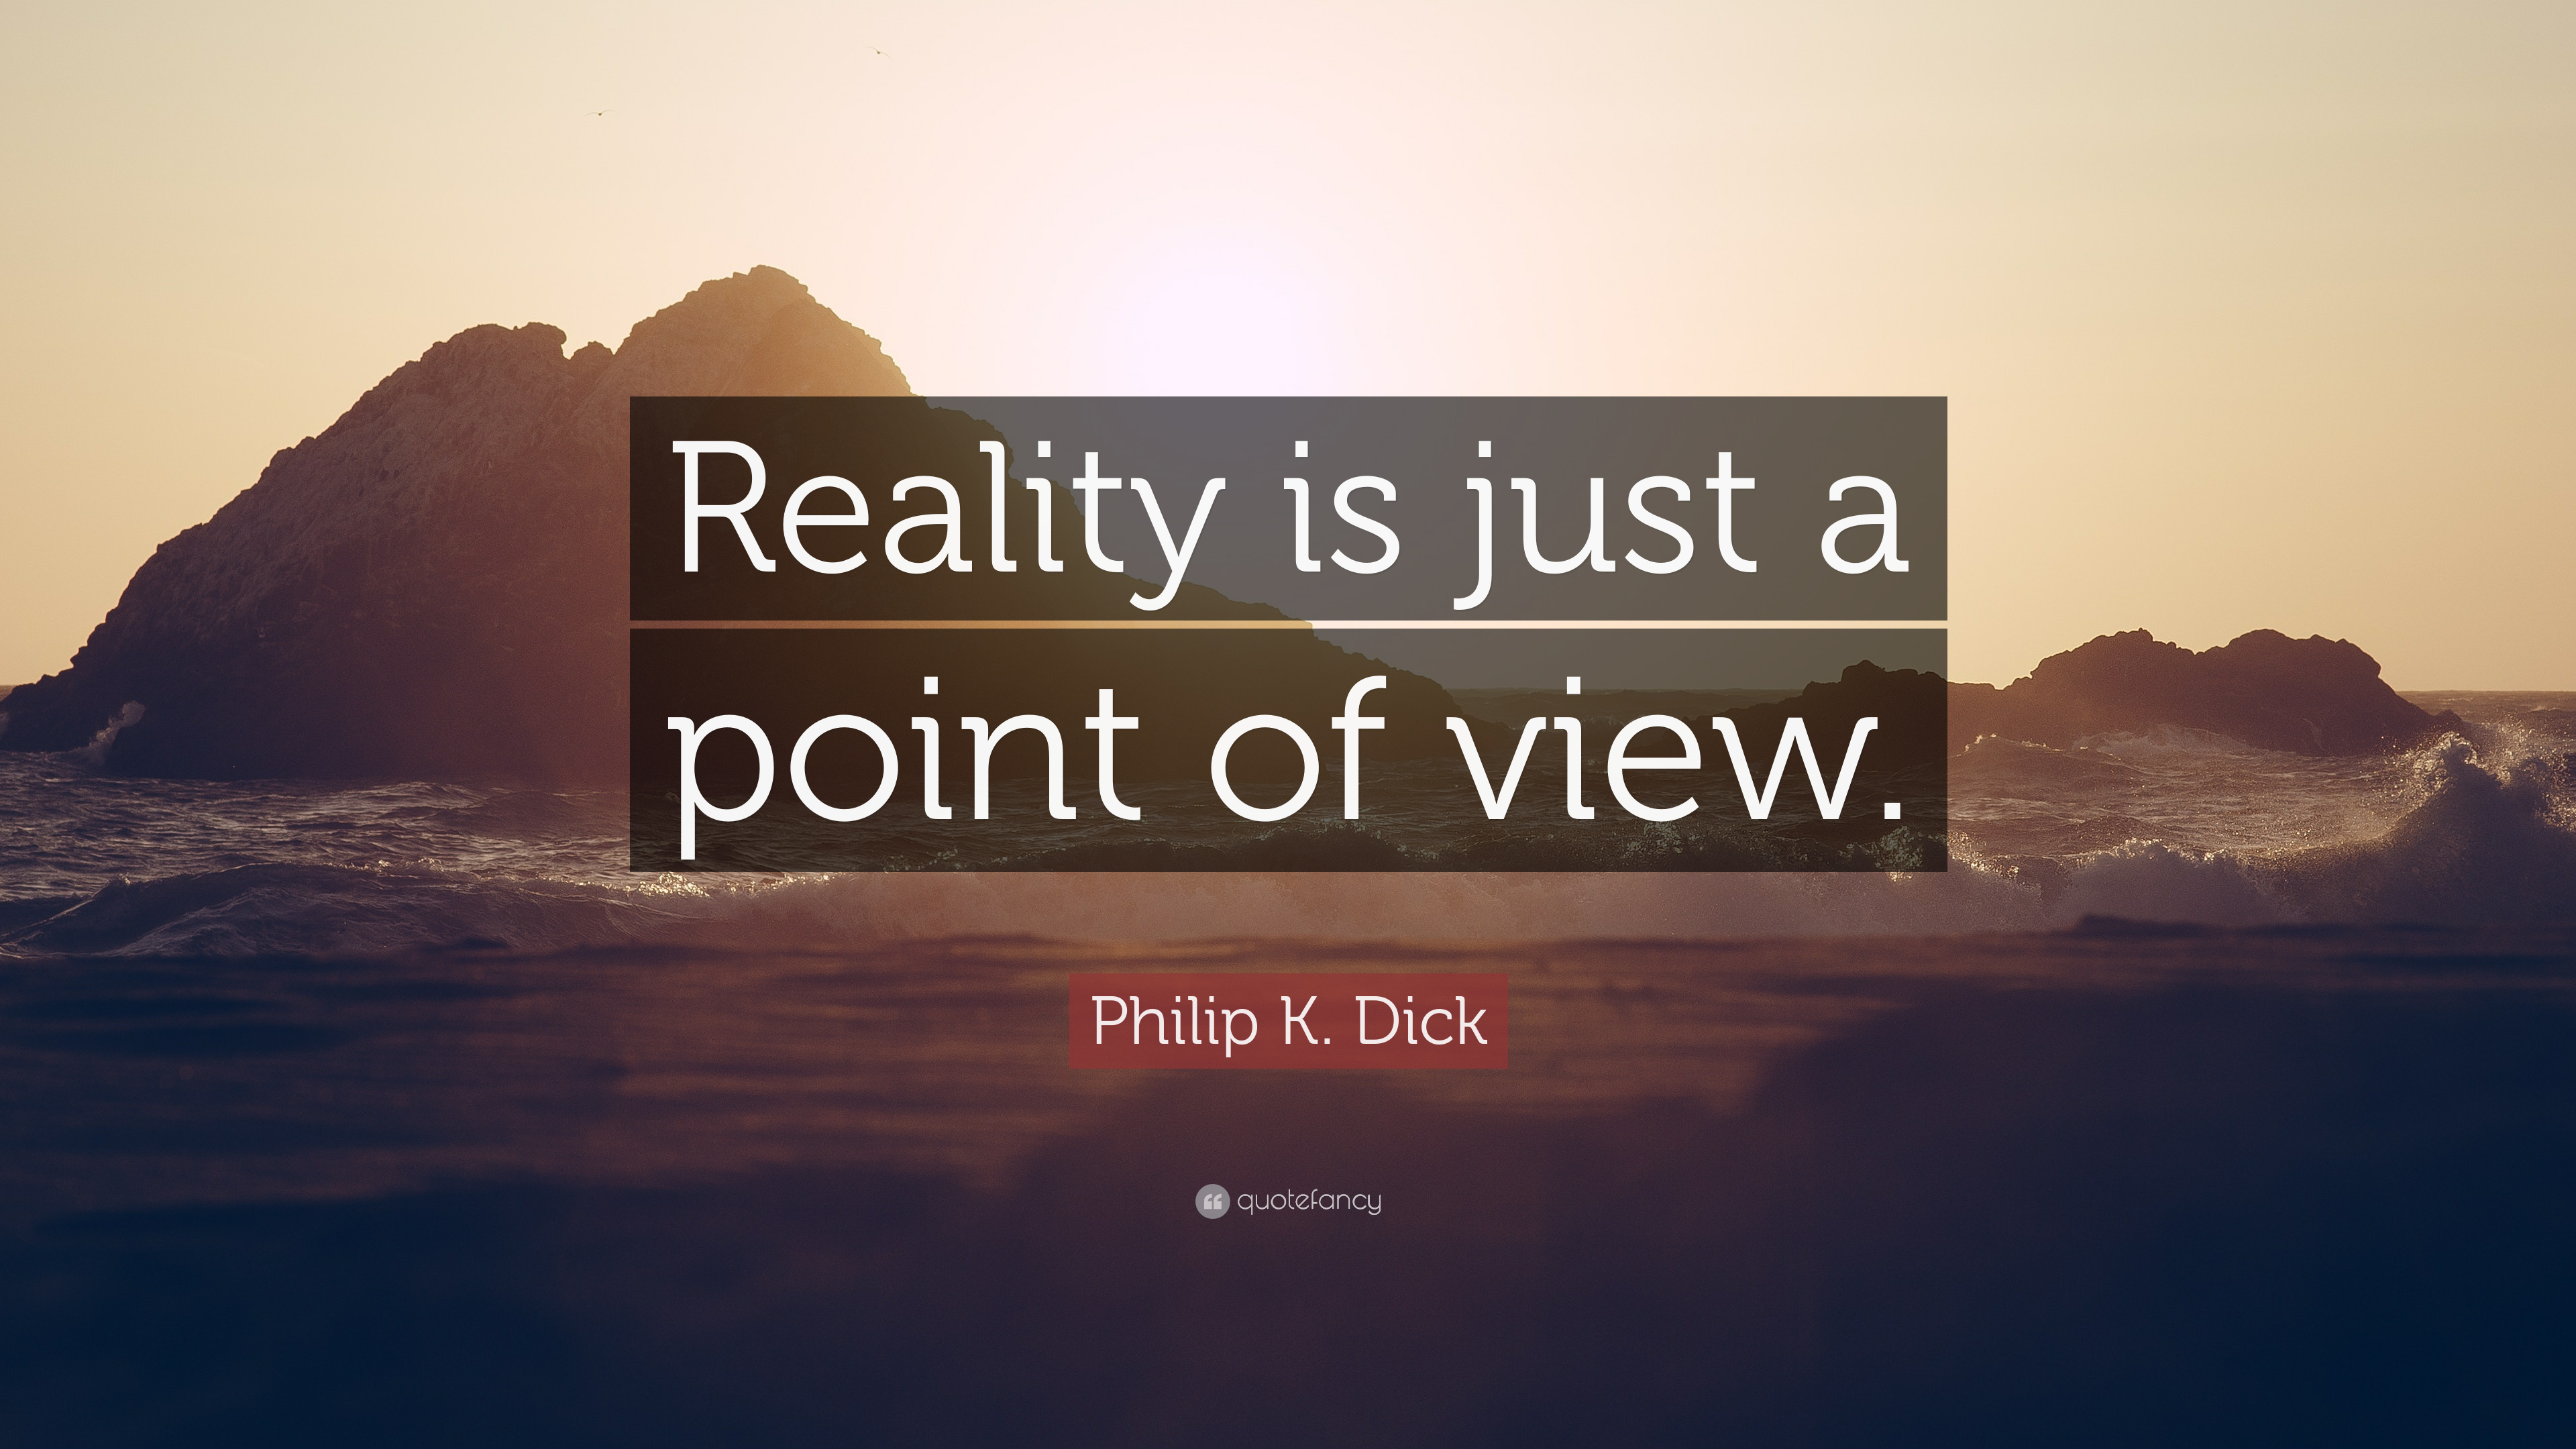 Above philip k dick quote